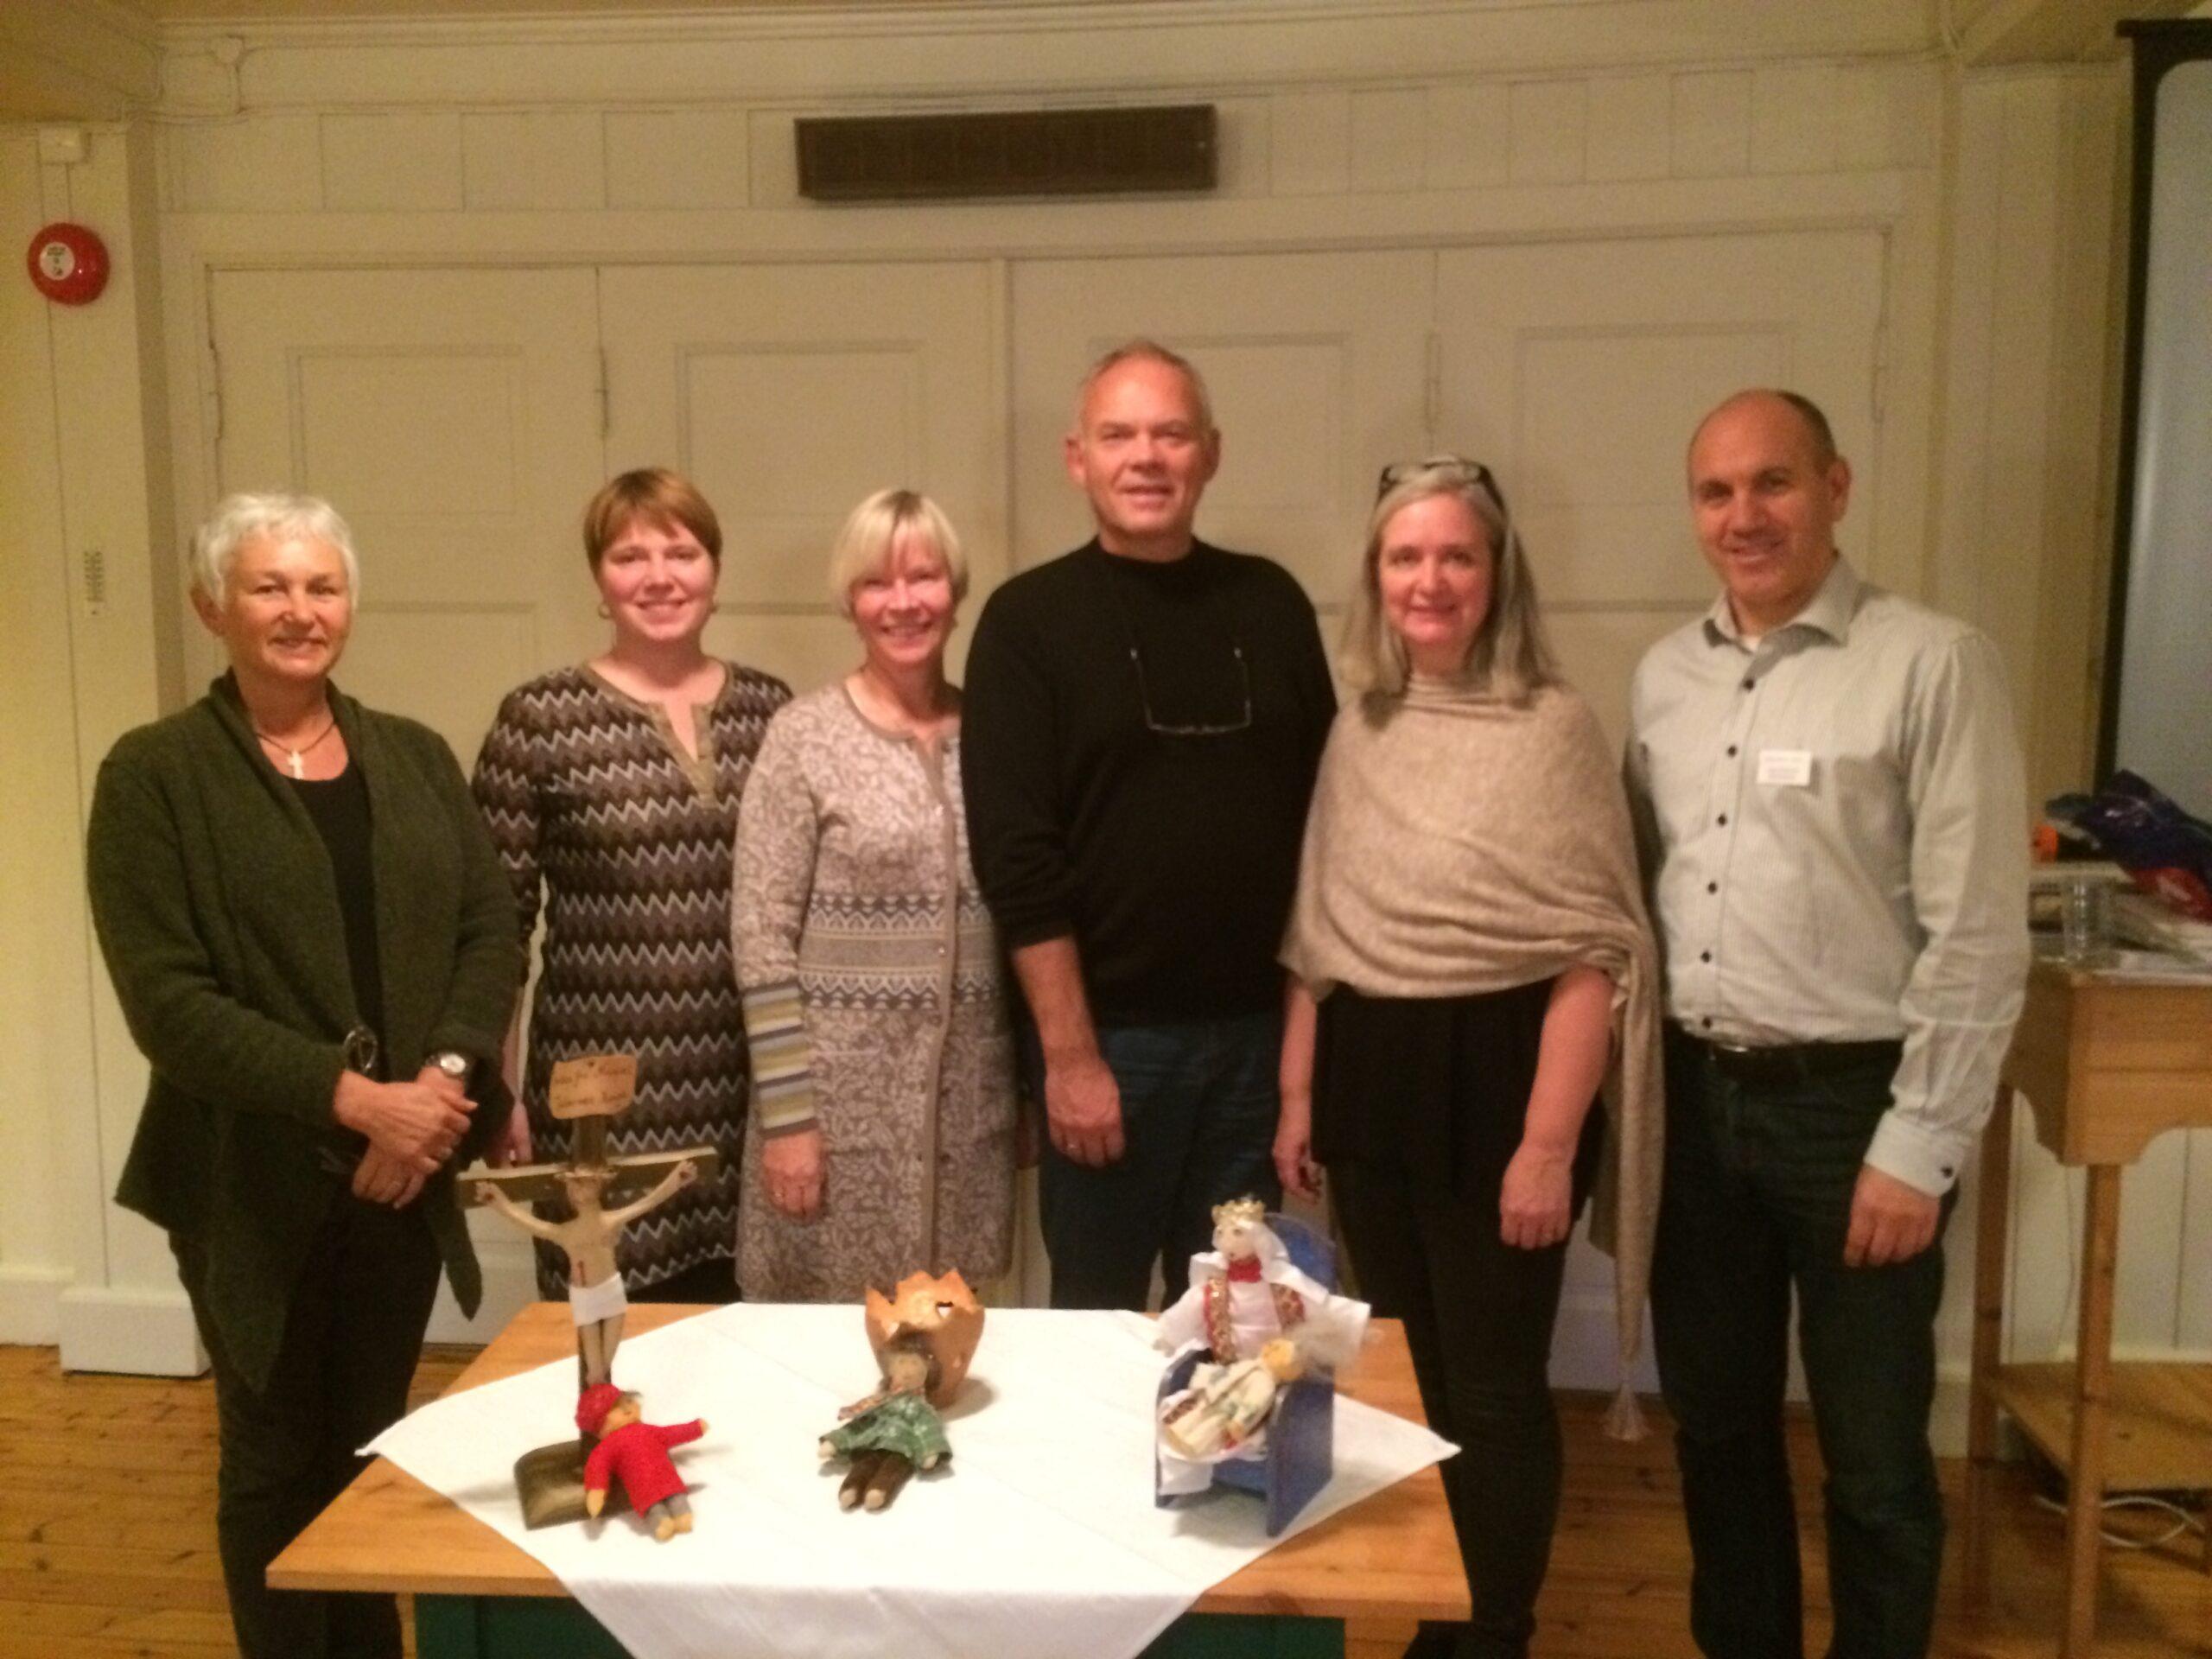 Vellykket seminar i Hallingdal